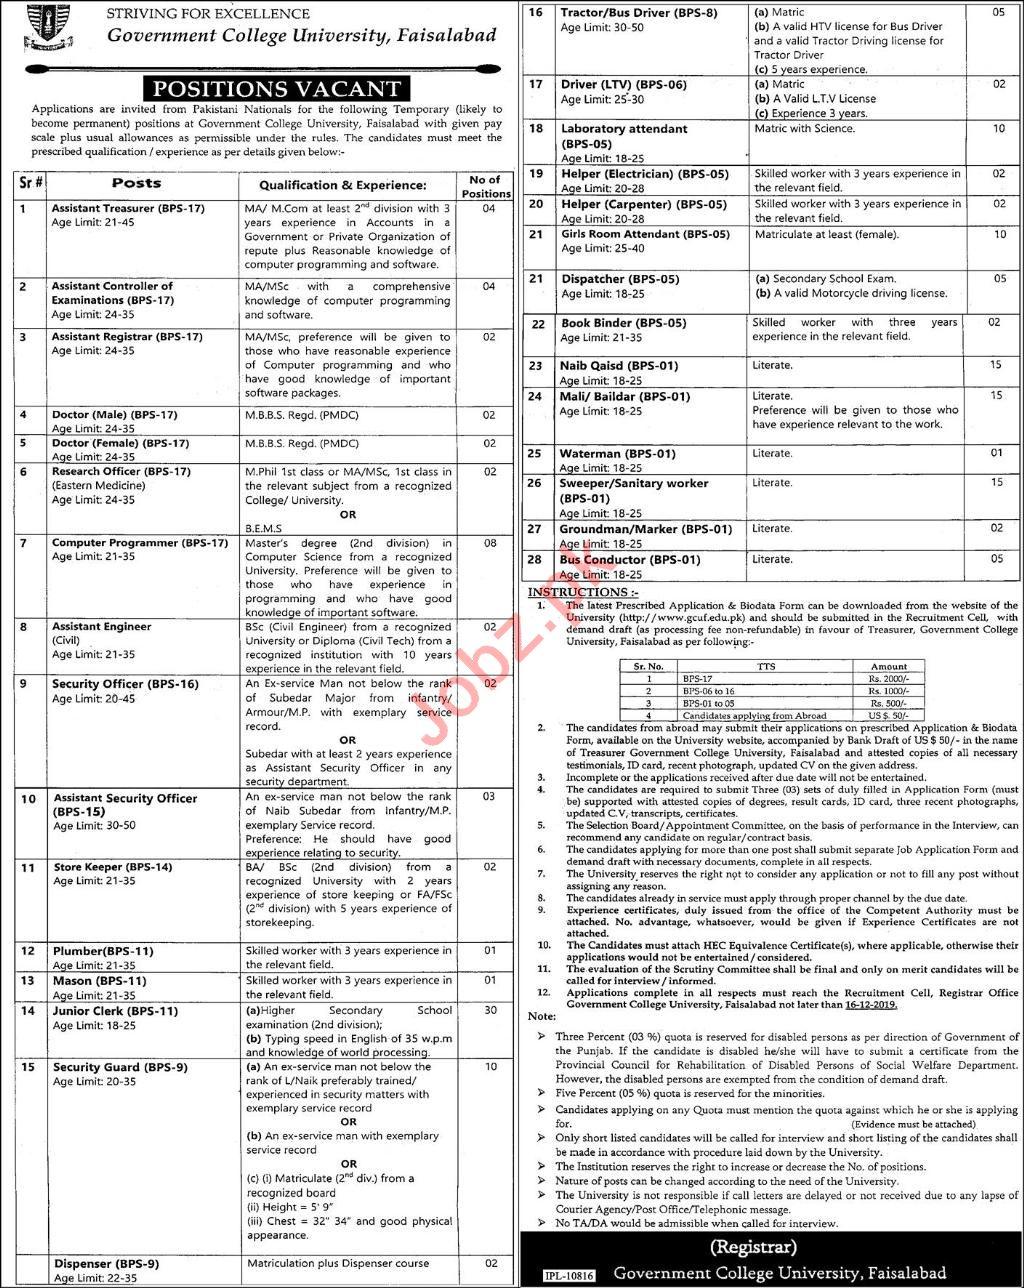 Government College University Faisalabad GCUF Jobs 2019